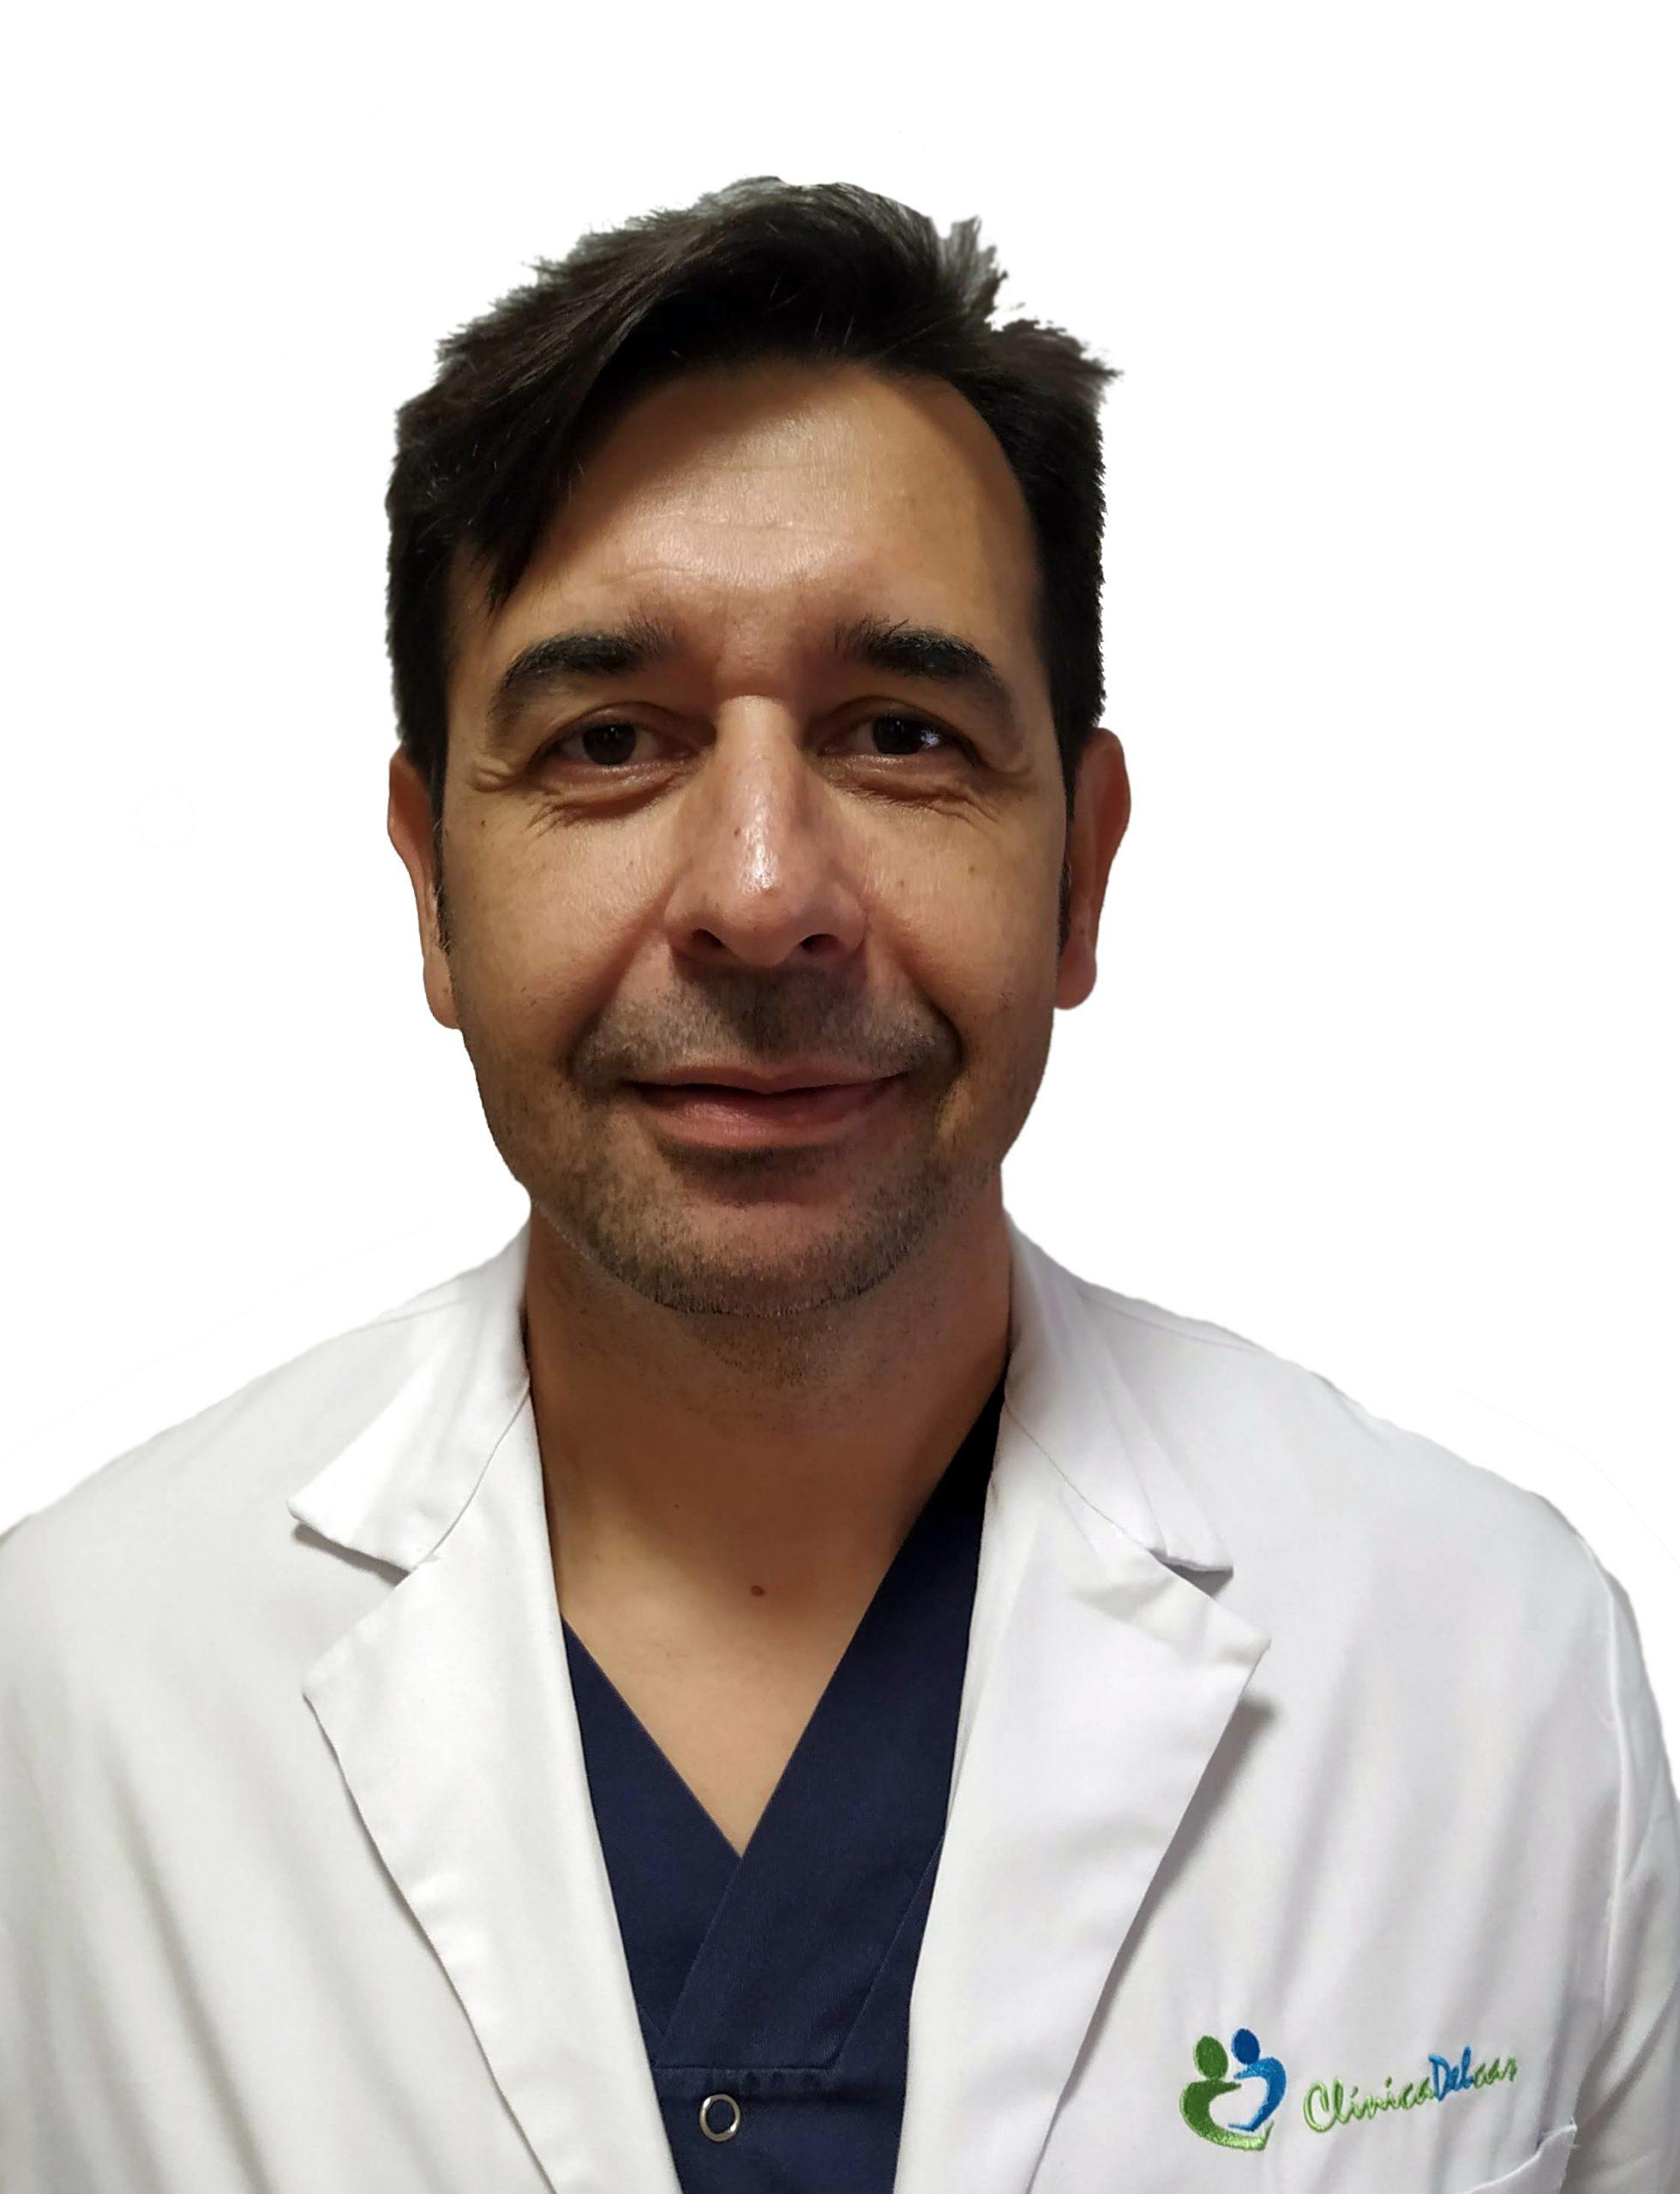 Pedro Jesús Arellano González